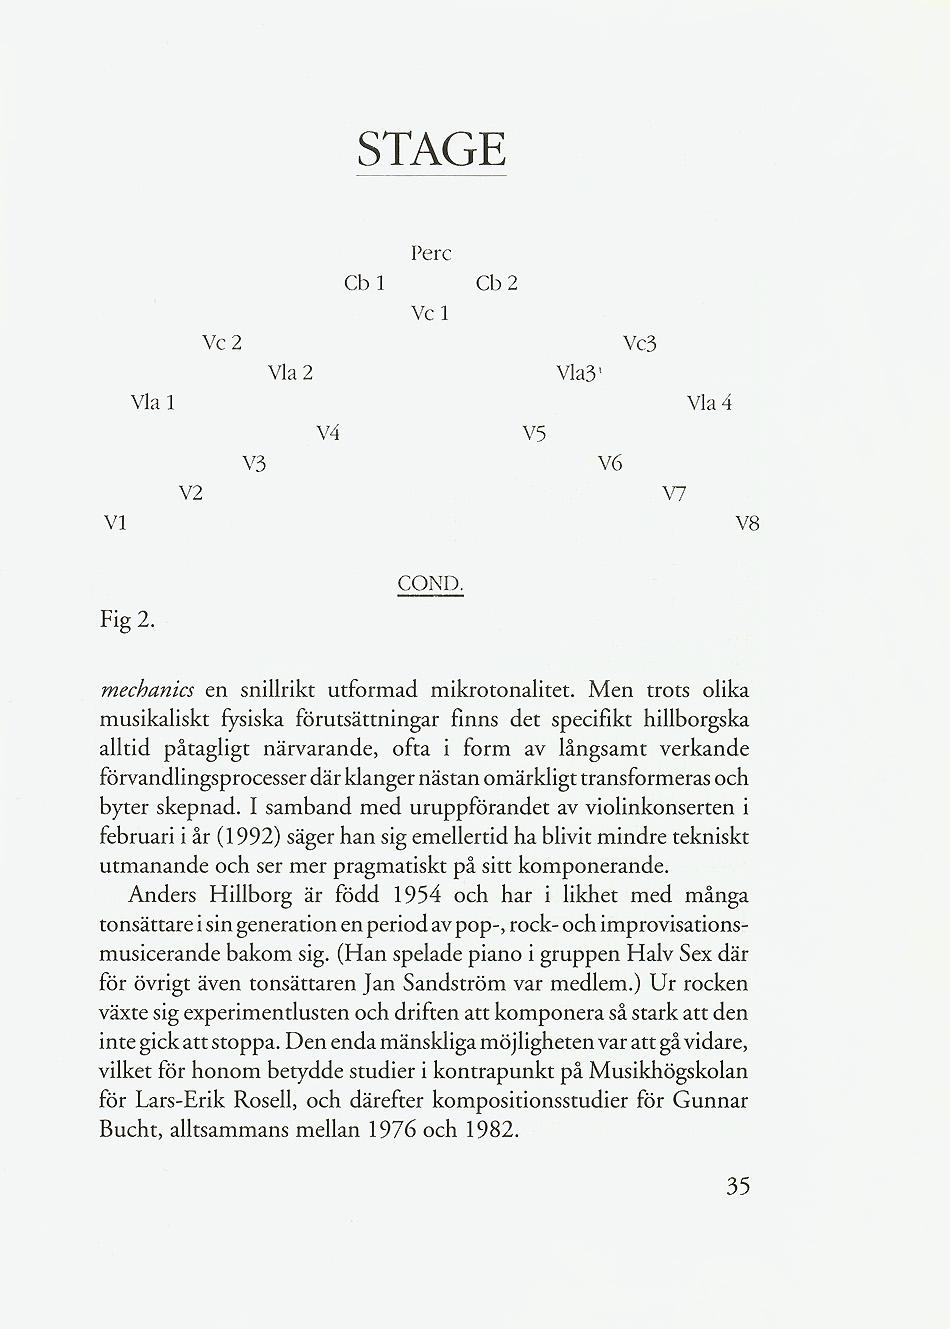 KMA_Arsskrift_1991_s35